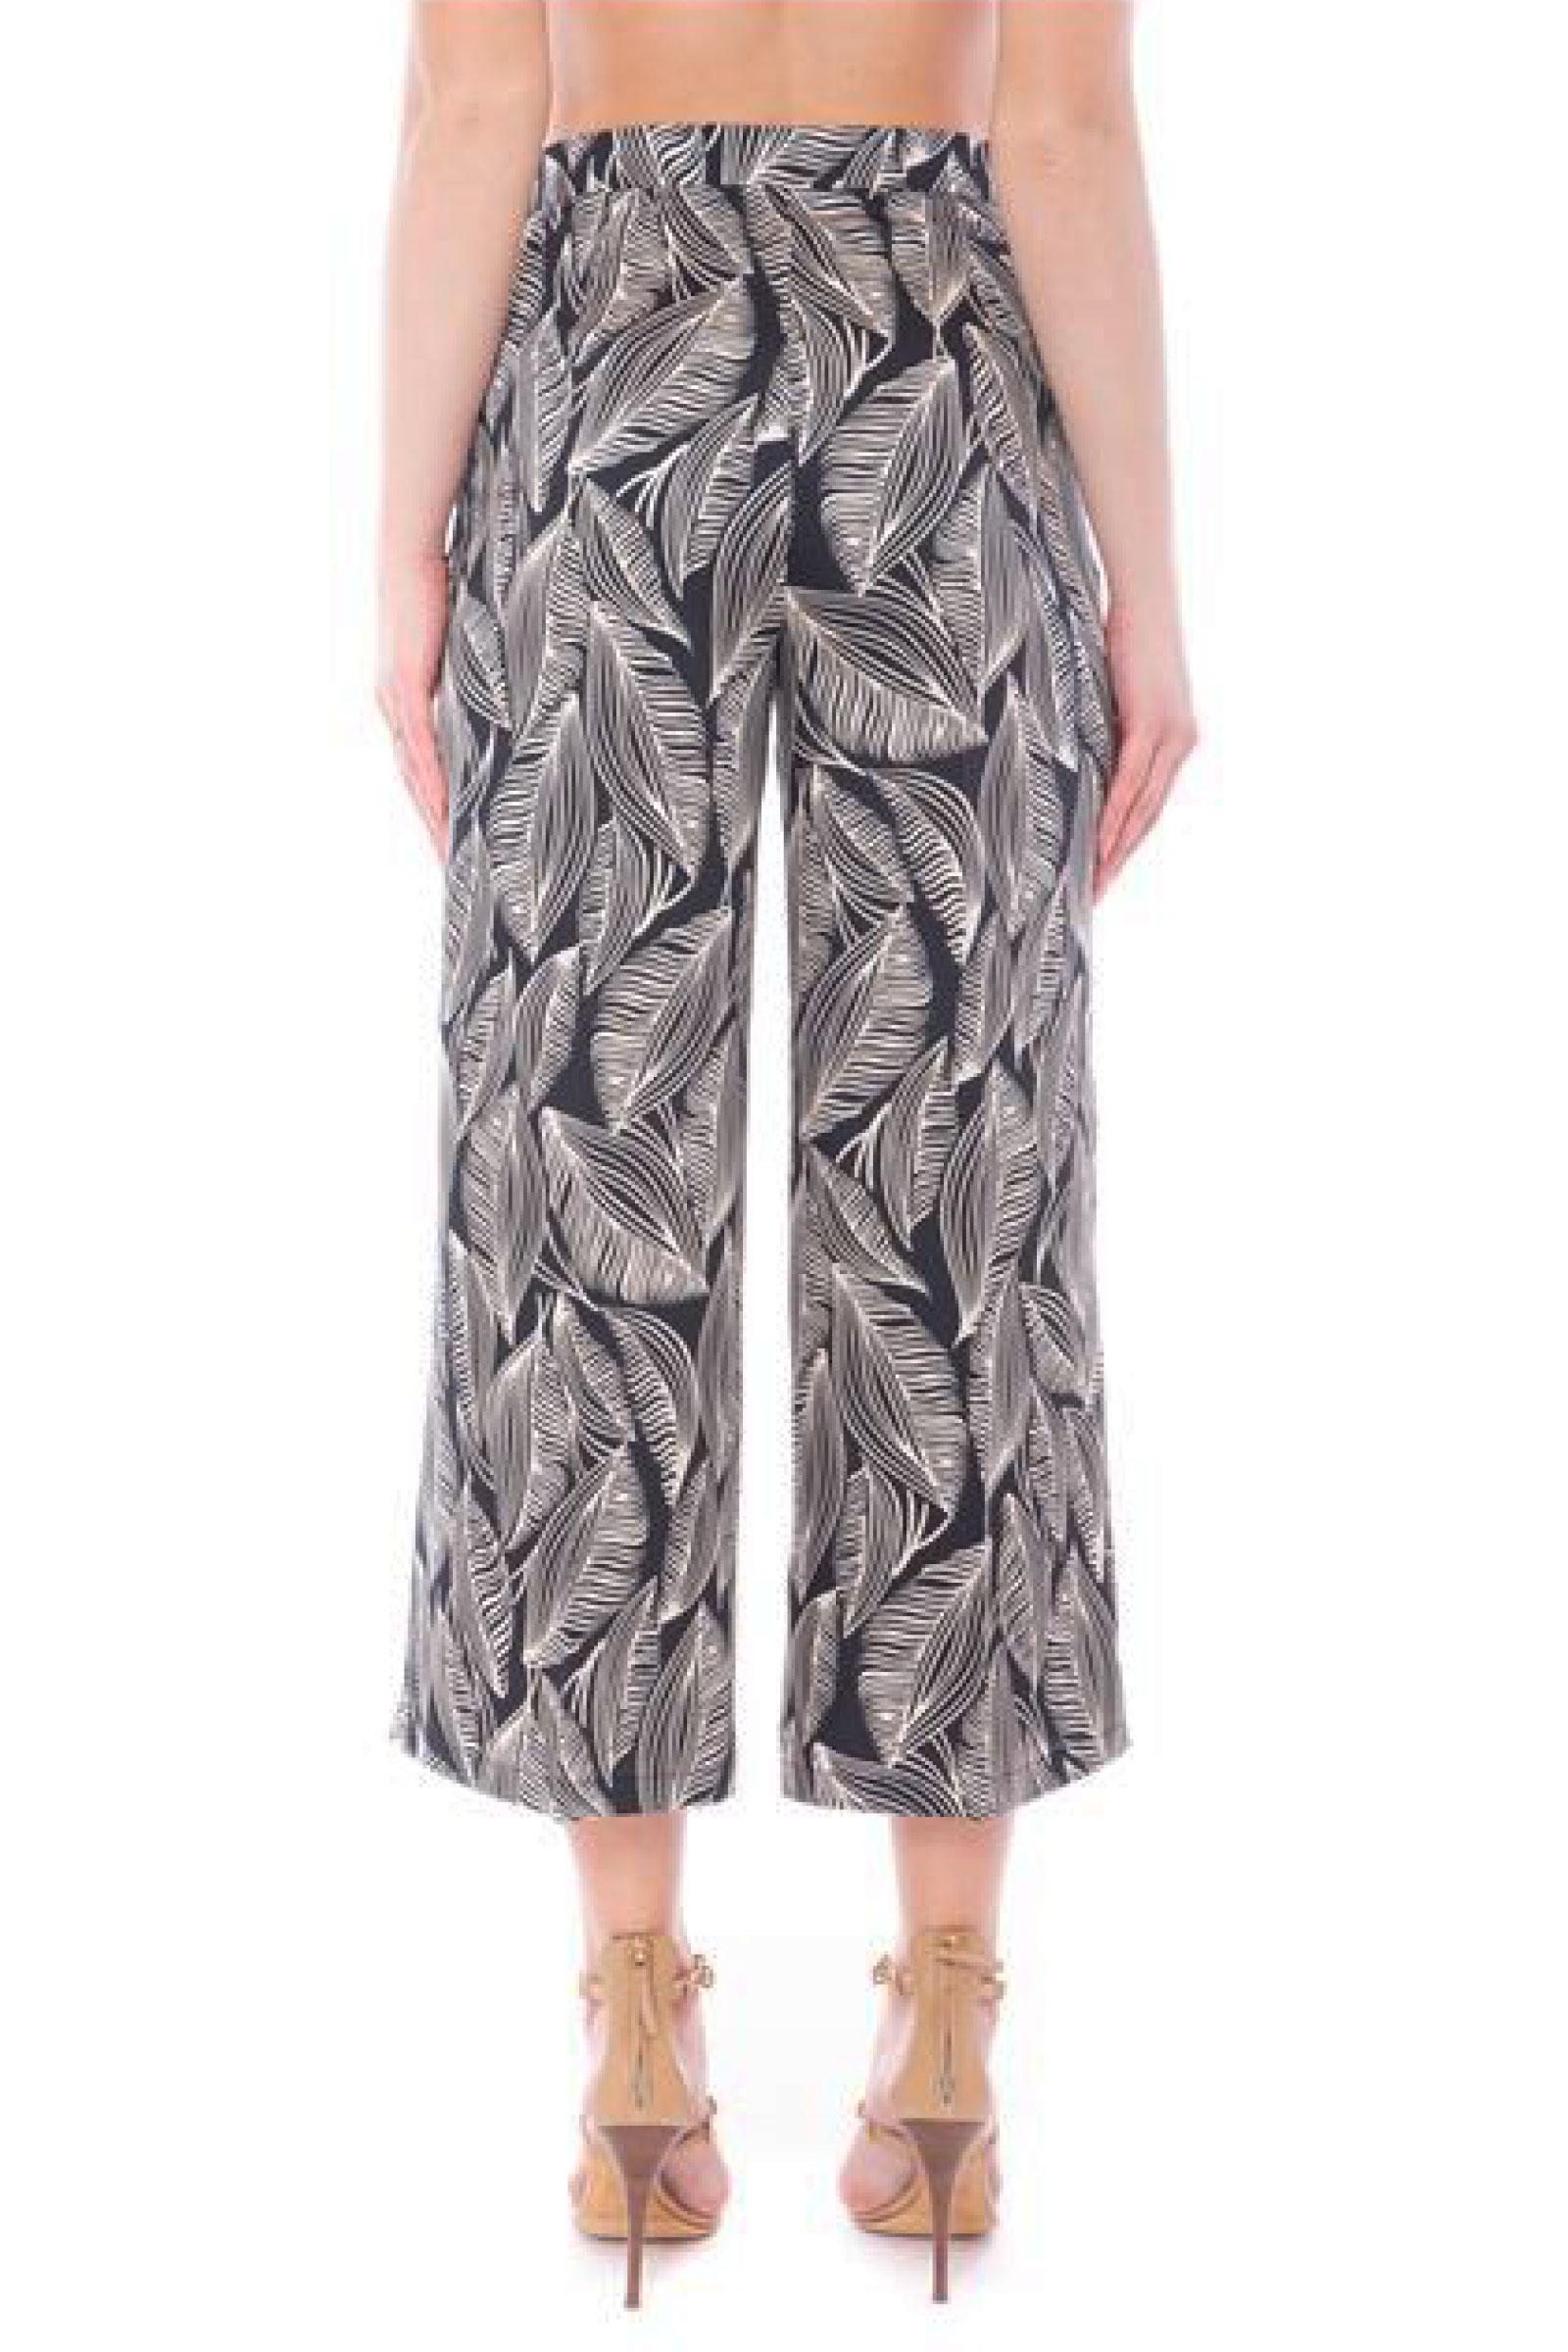 EMME MARELLA Pantalone Modello CORNICE EMME MARELLA | Pantalone | 51311314000003